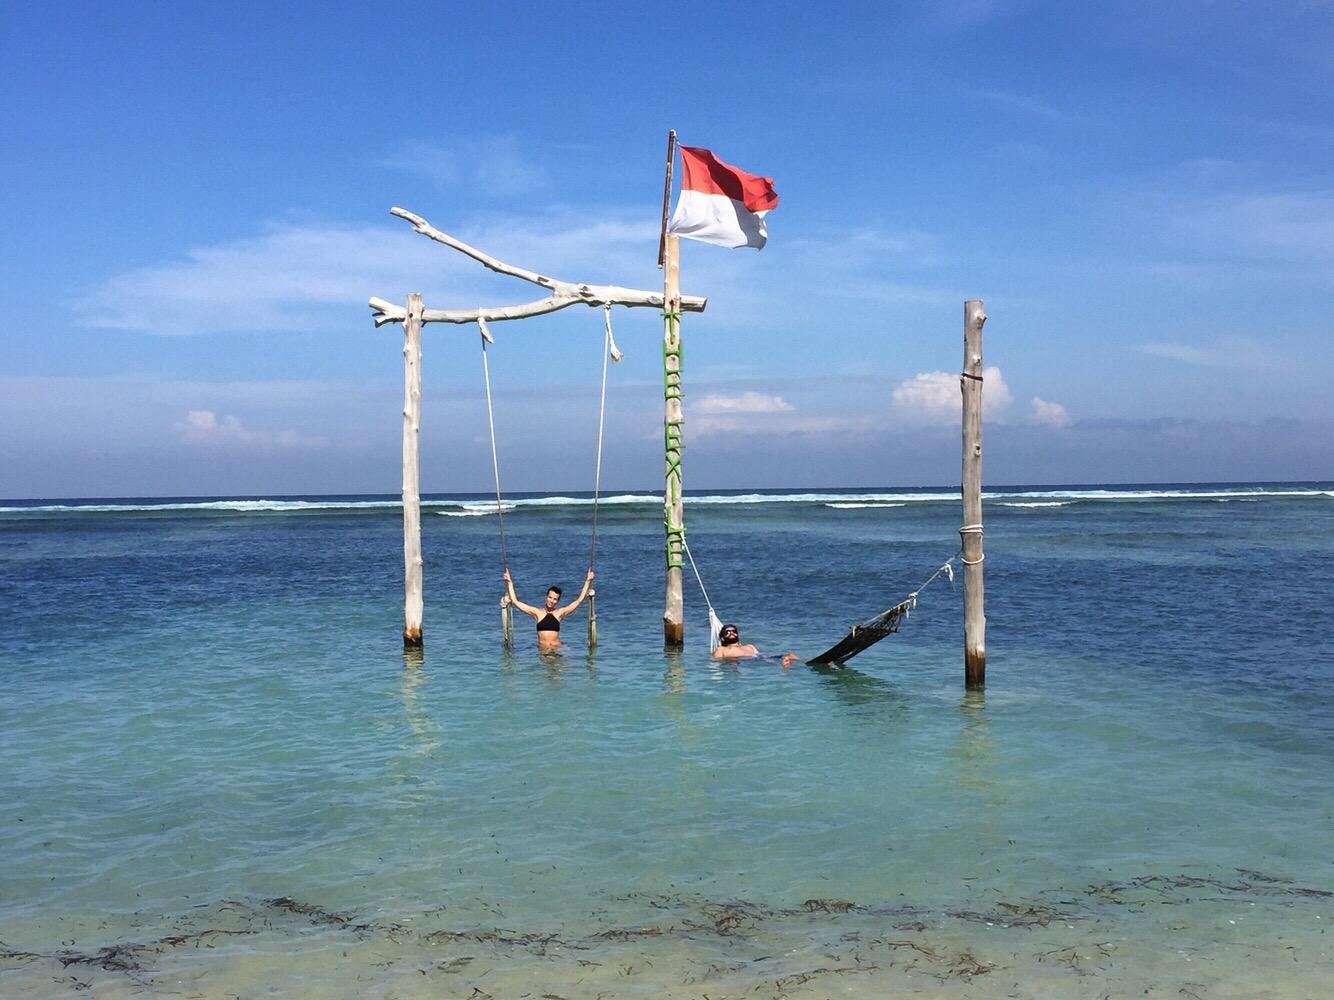 Gili T island, Indonesia | © Nikki Vargas